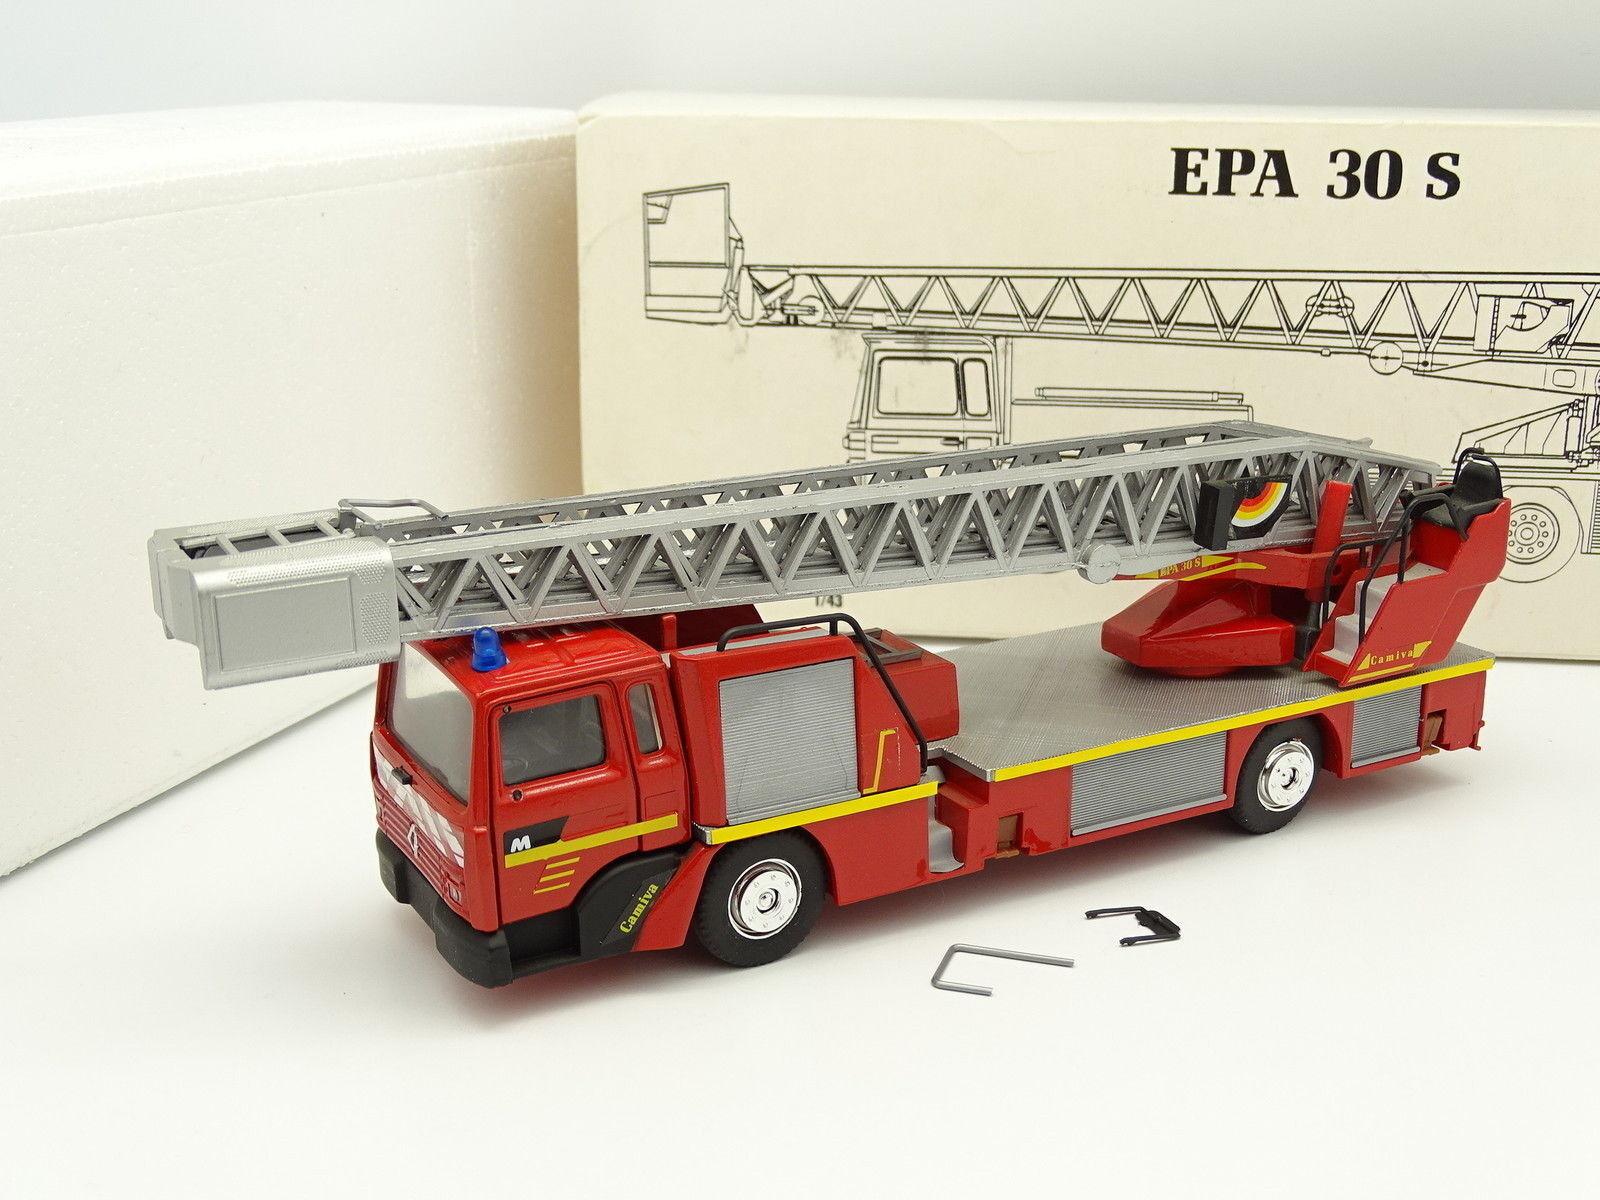 CEF CEF CEF Replex 1 43 - Renault EPA 30S Grande Echelle Pompiers 8d7ecc